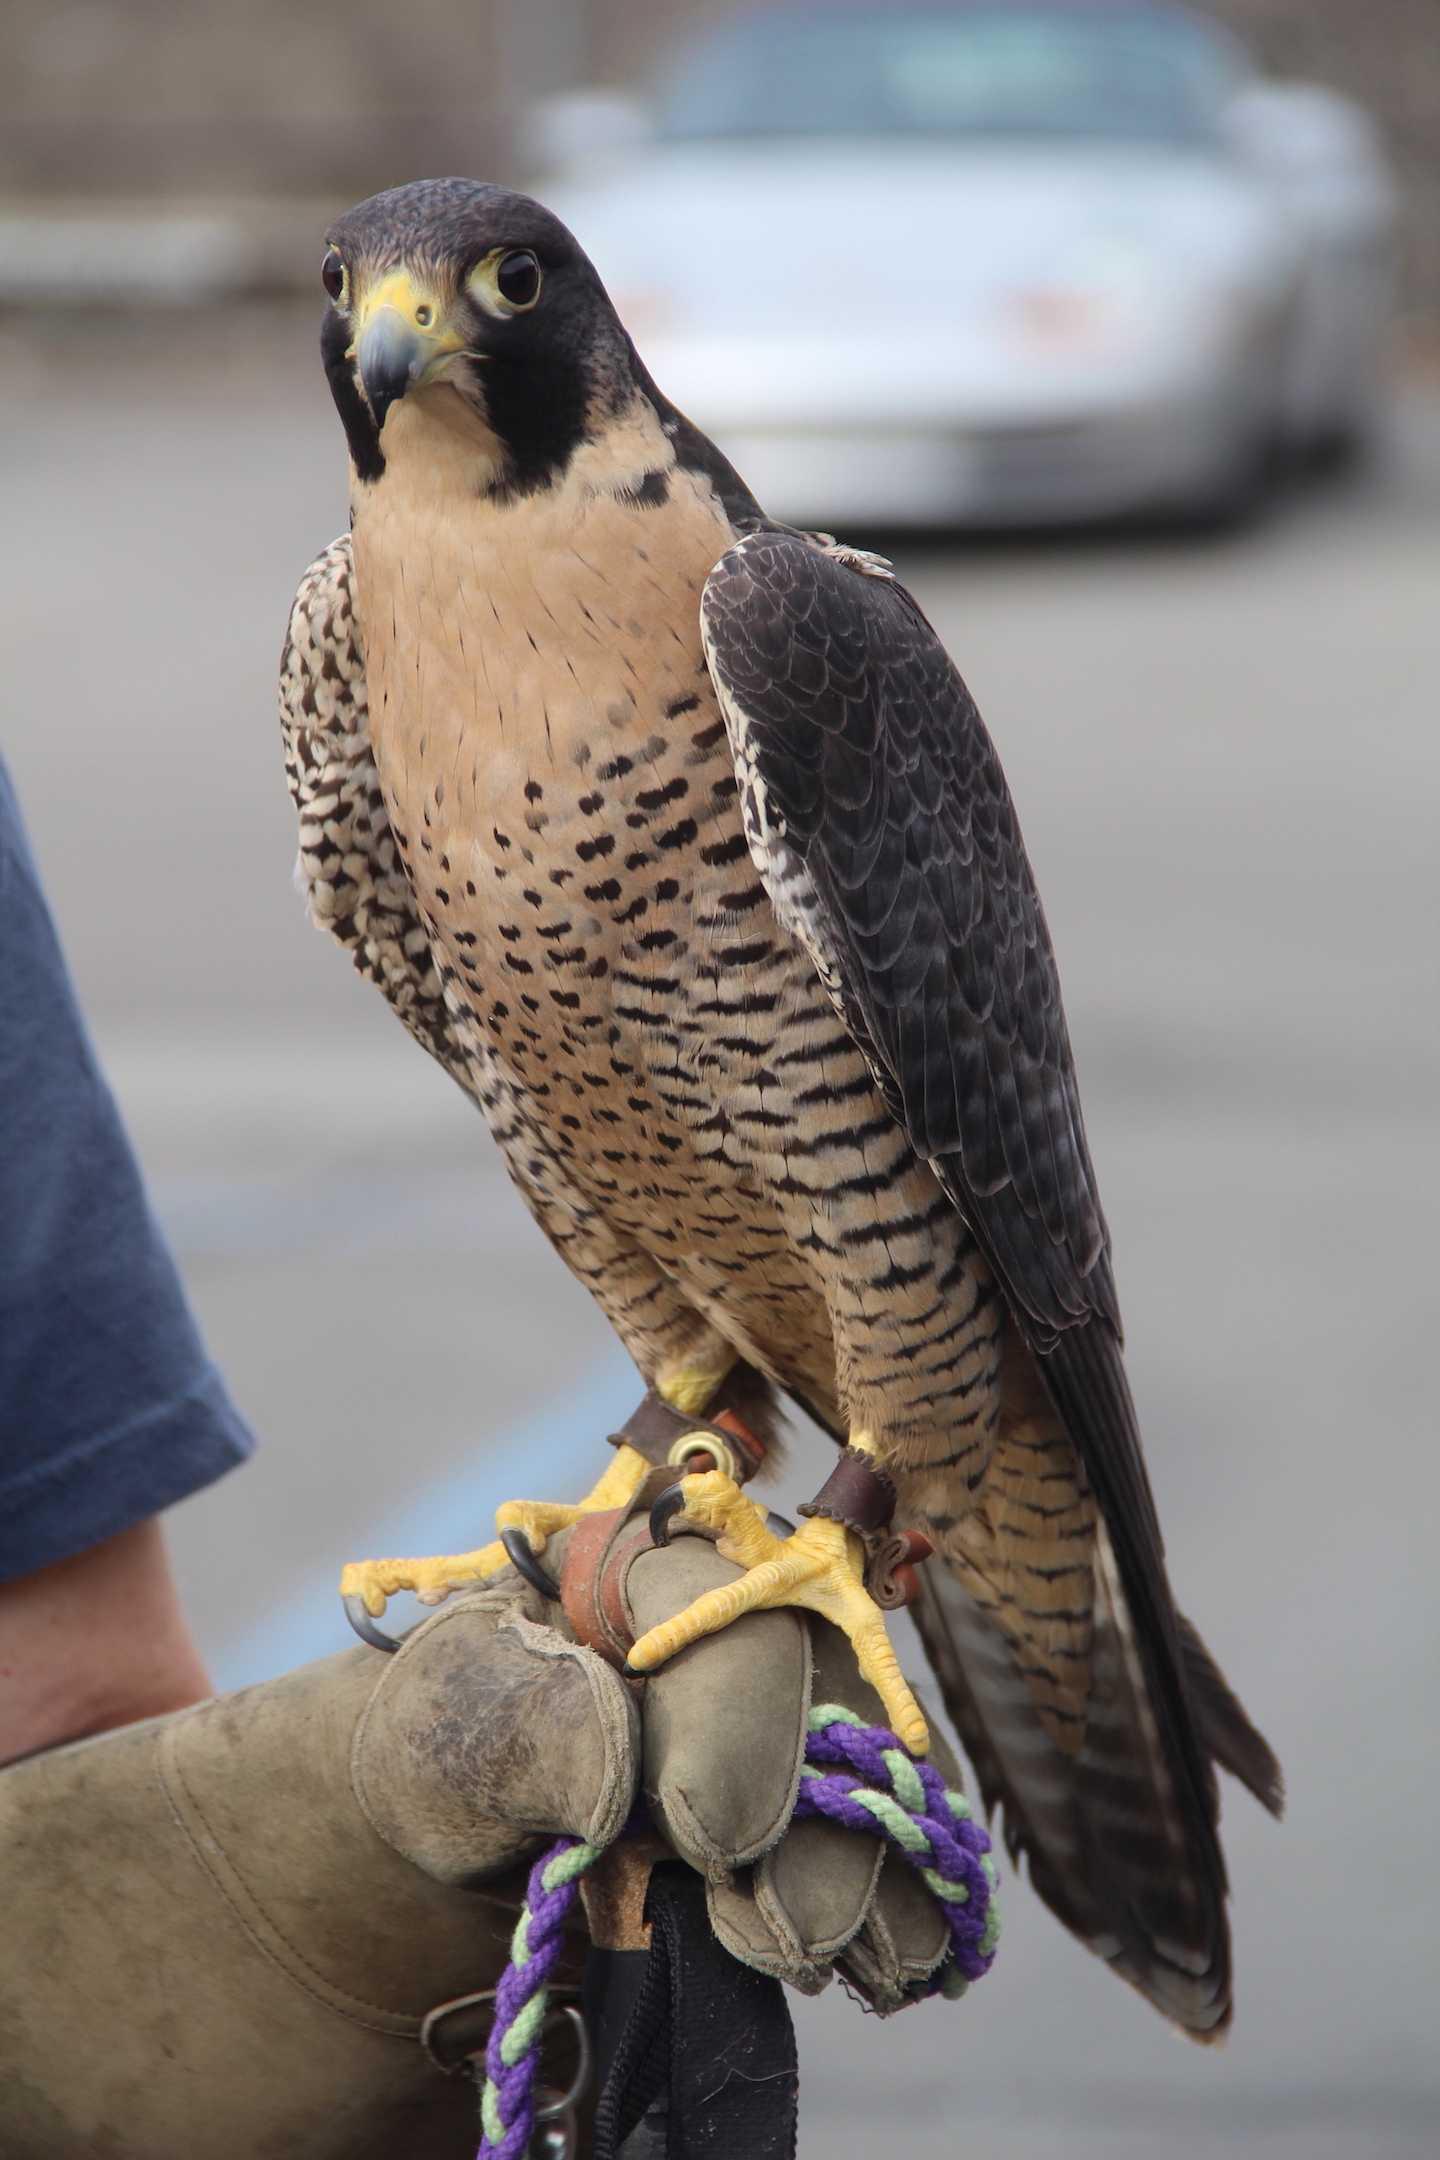 Goose the Falcon perches outside